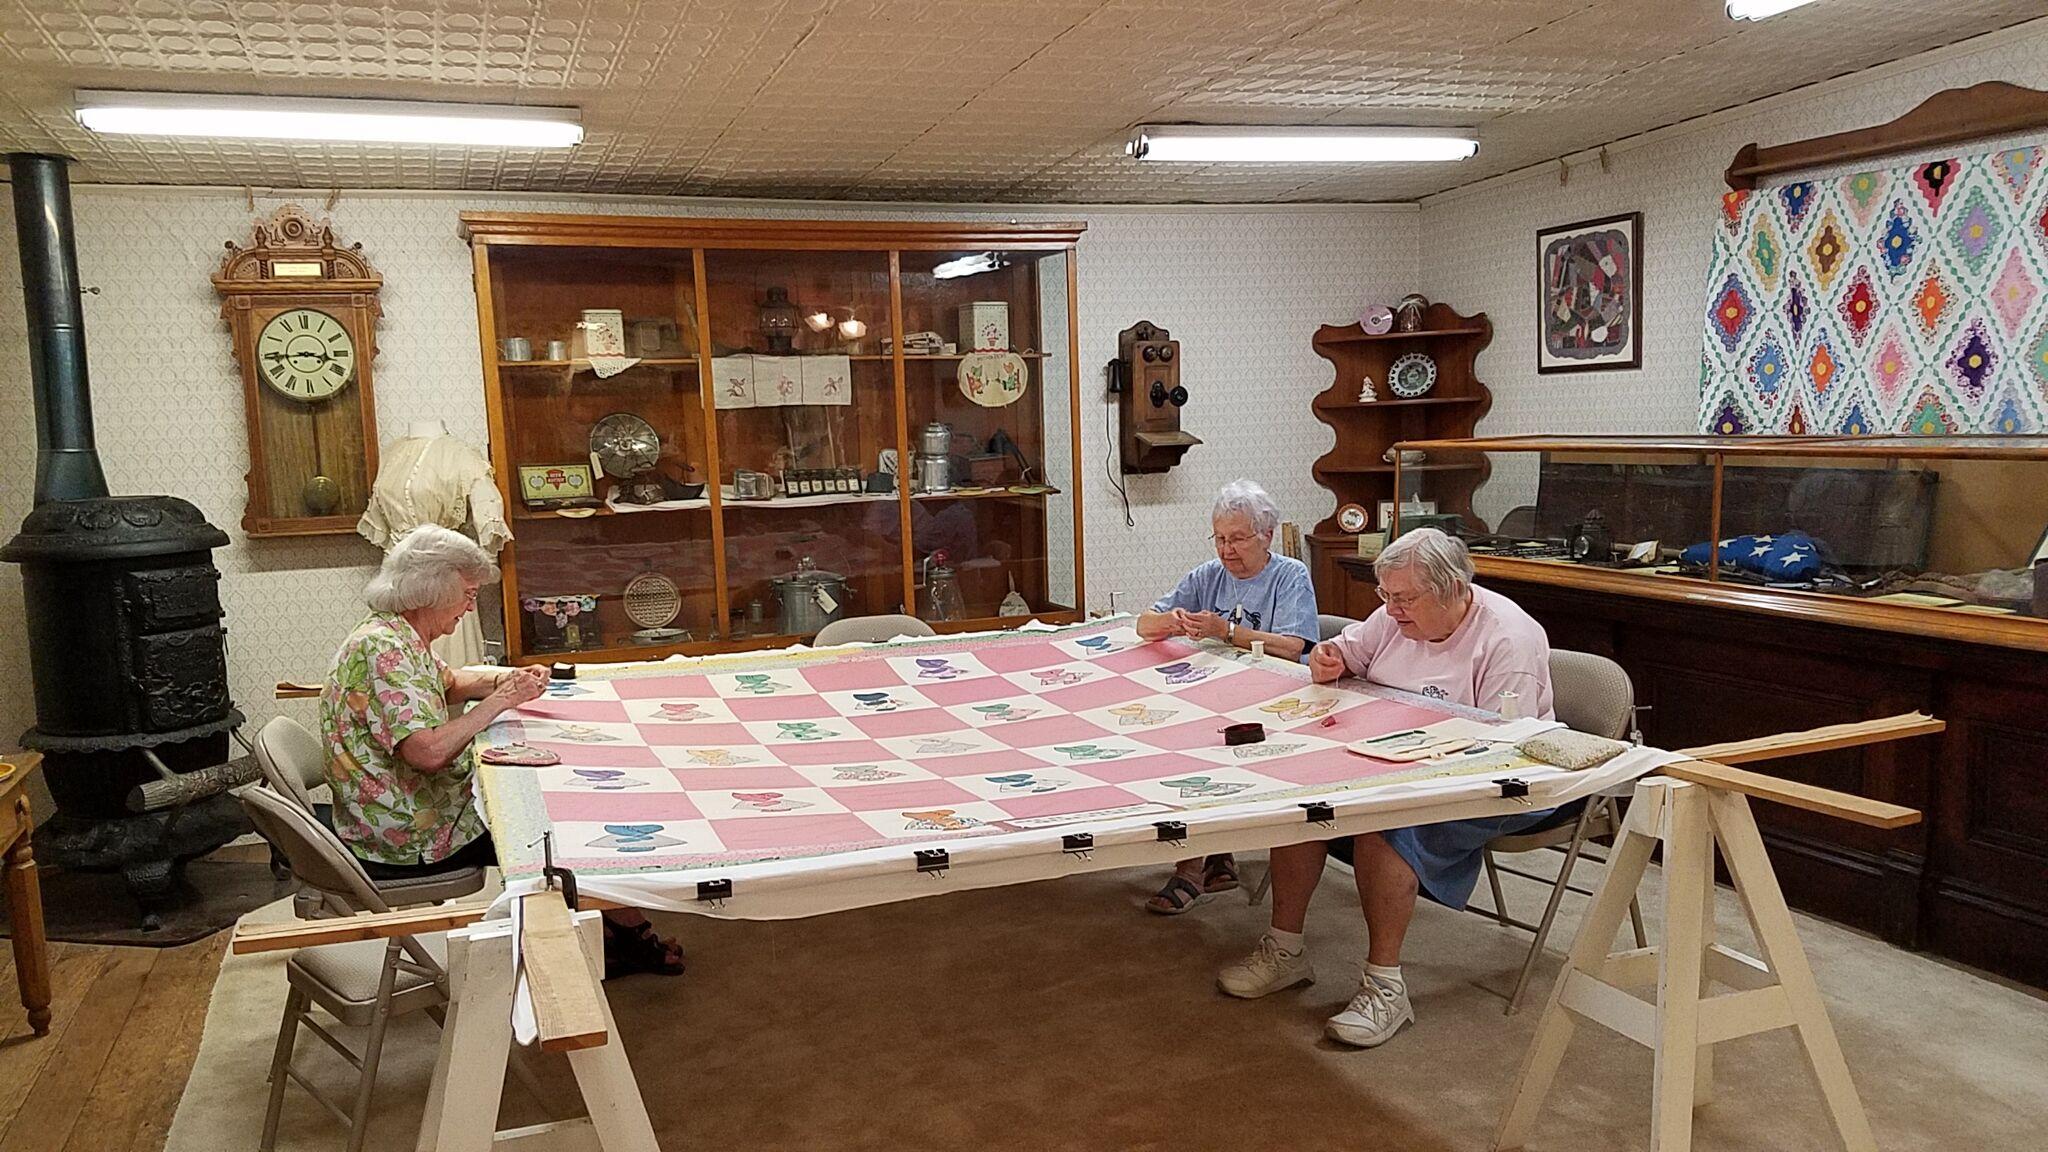 Kansas dickinson county abilene - Ladies Quilting Abilene Kansas I Love How Dickinson County